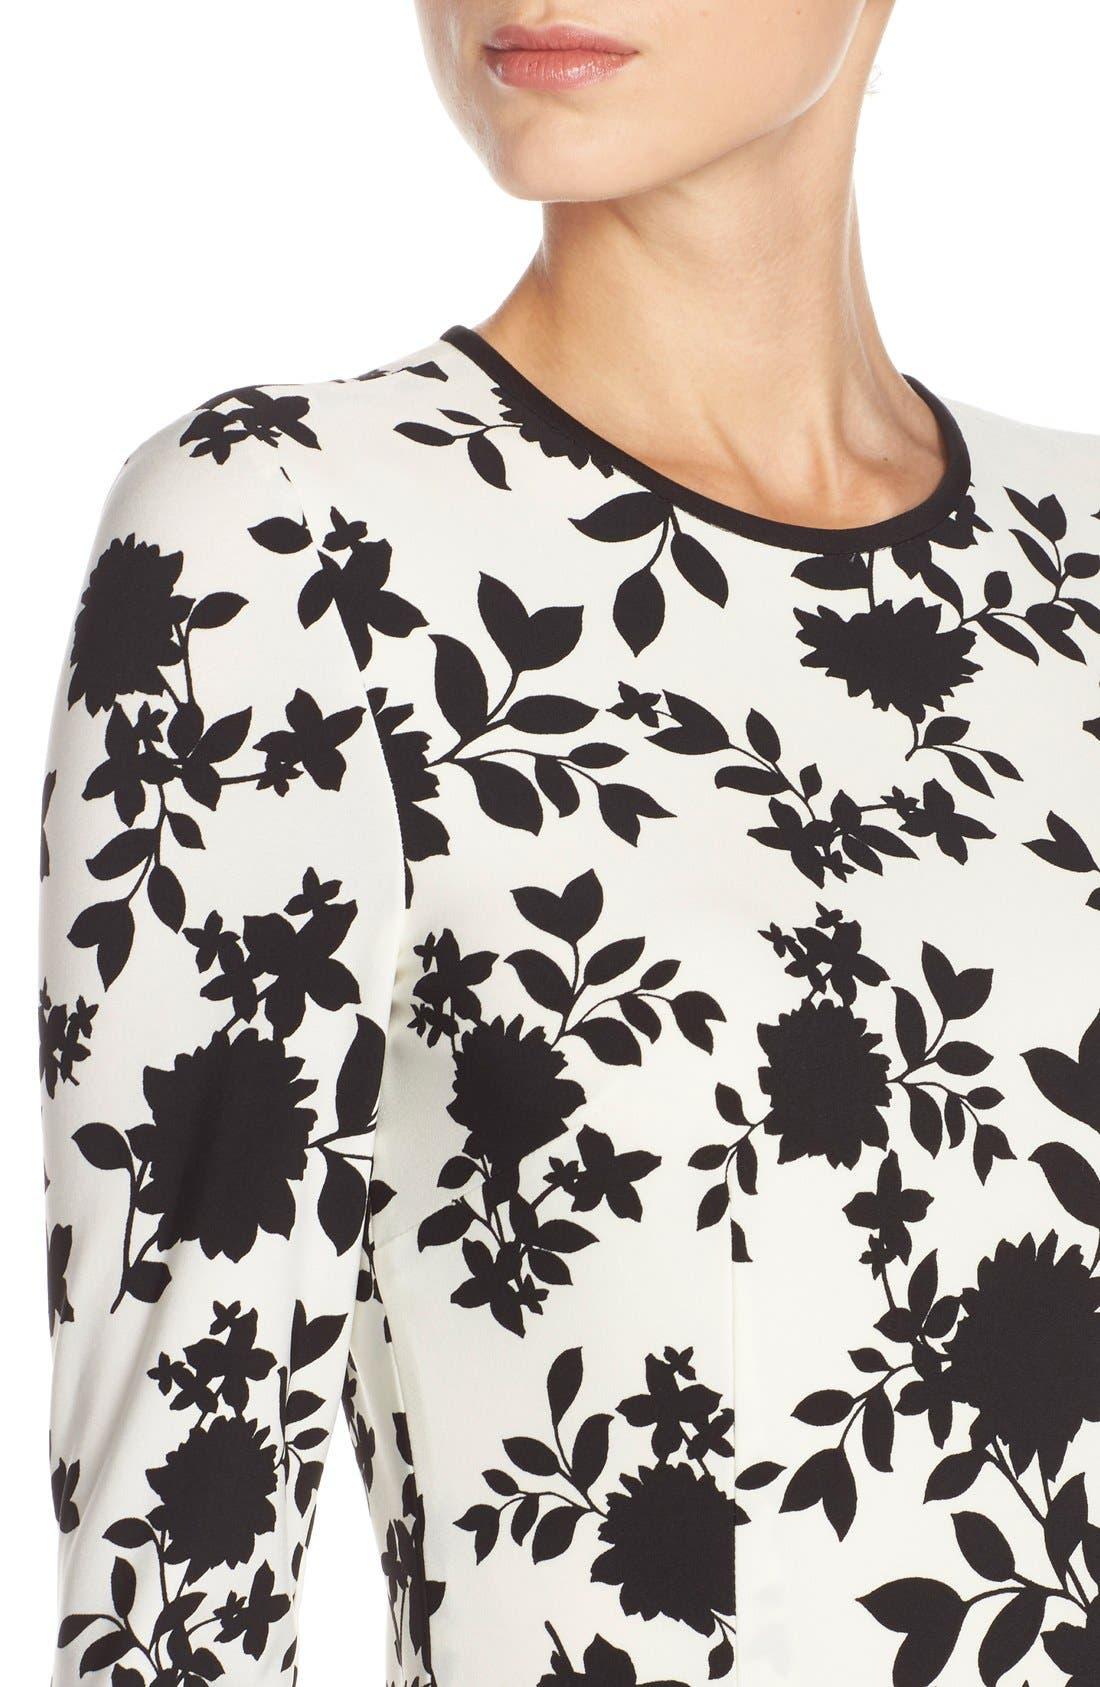 Floral Print Jersey Midi Dress,                             Alternate thumbnail 3, color,                             005